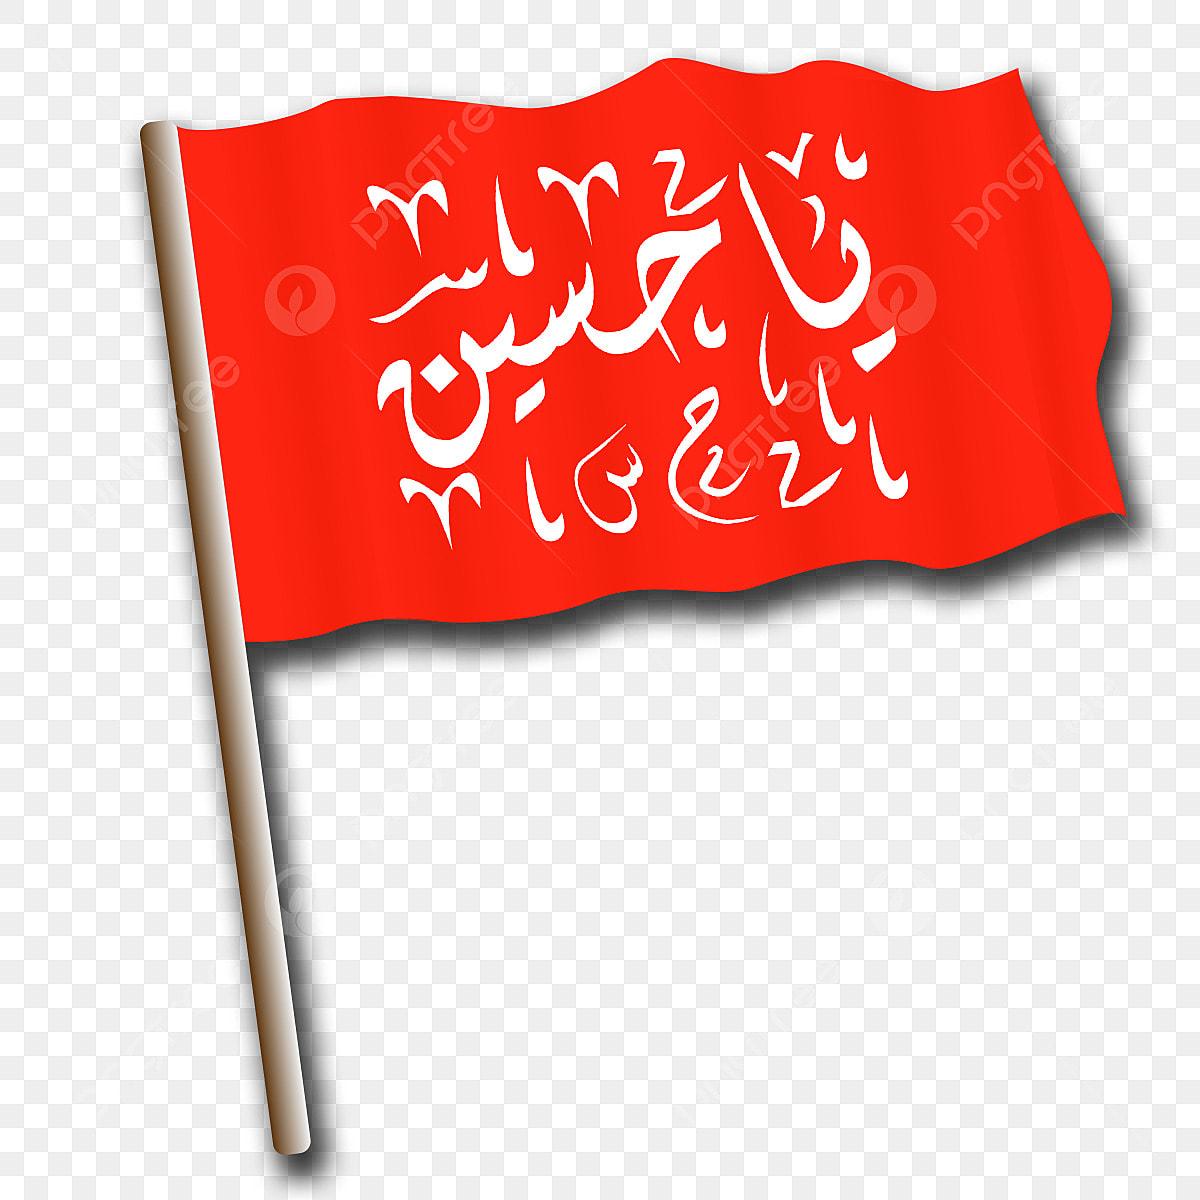 Hazrat Imam Hussain Flag Png With Calligraphy Muharram Design